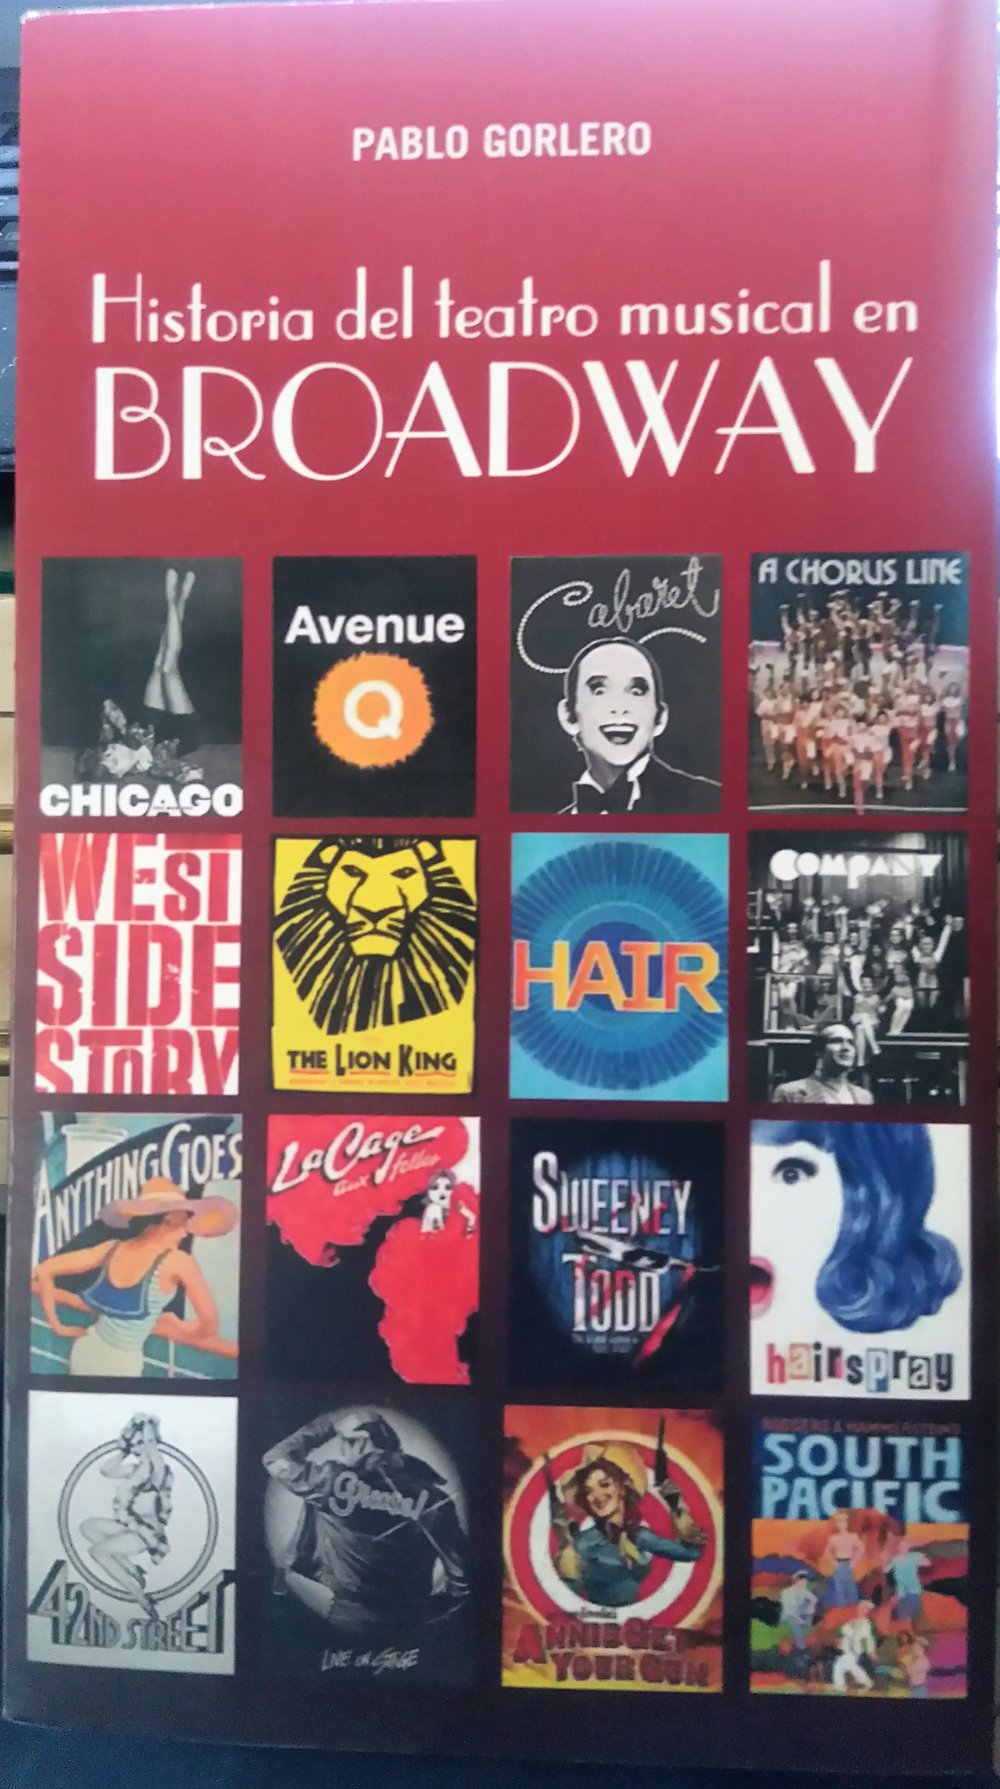 Required Reading Material: Historia del teatro musical de Broadway -